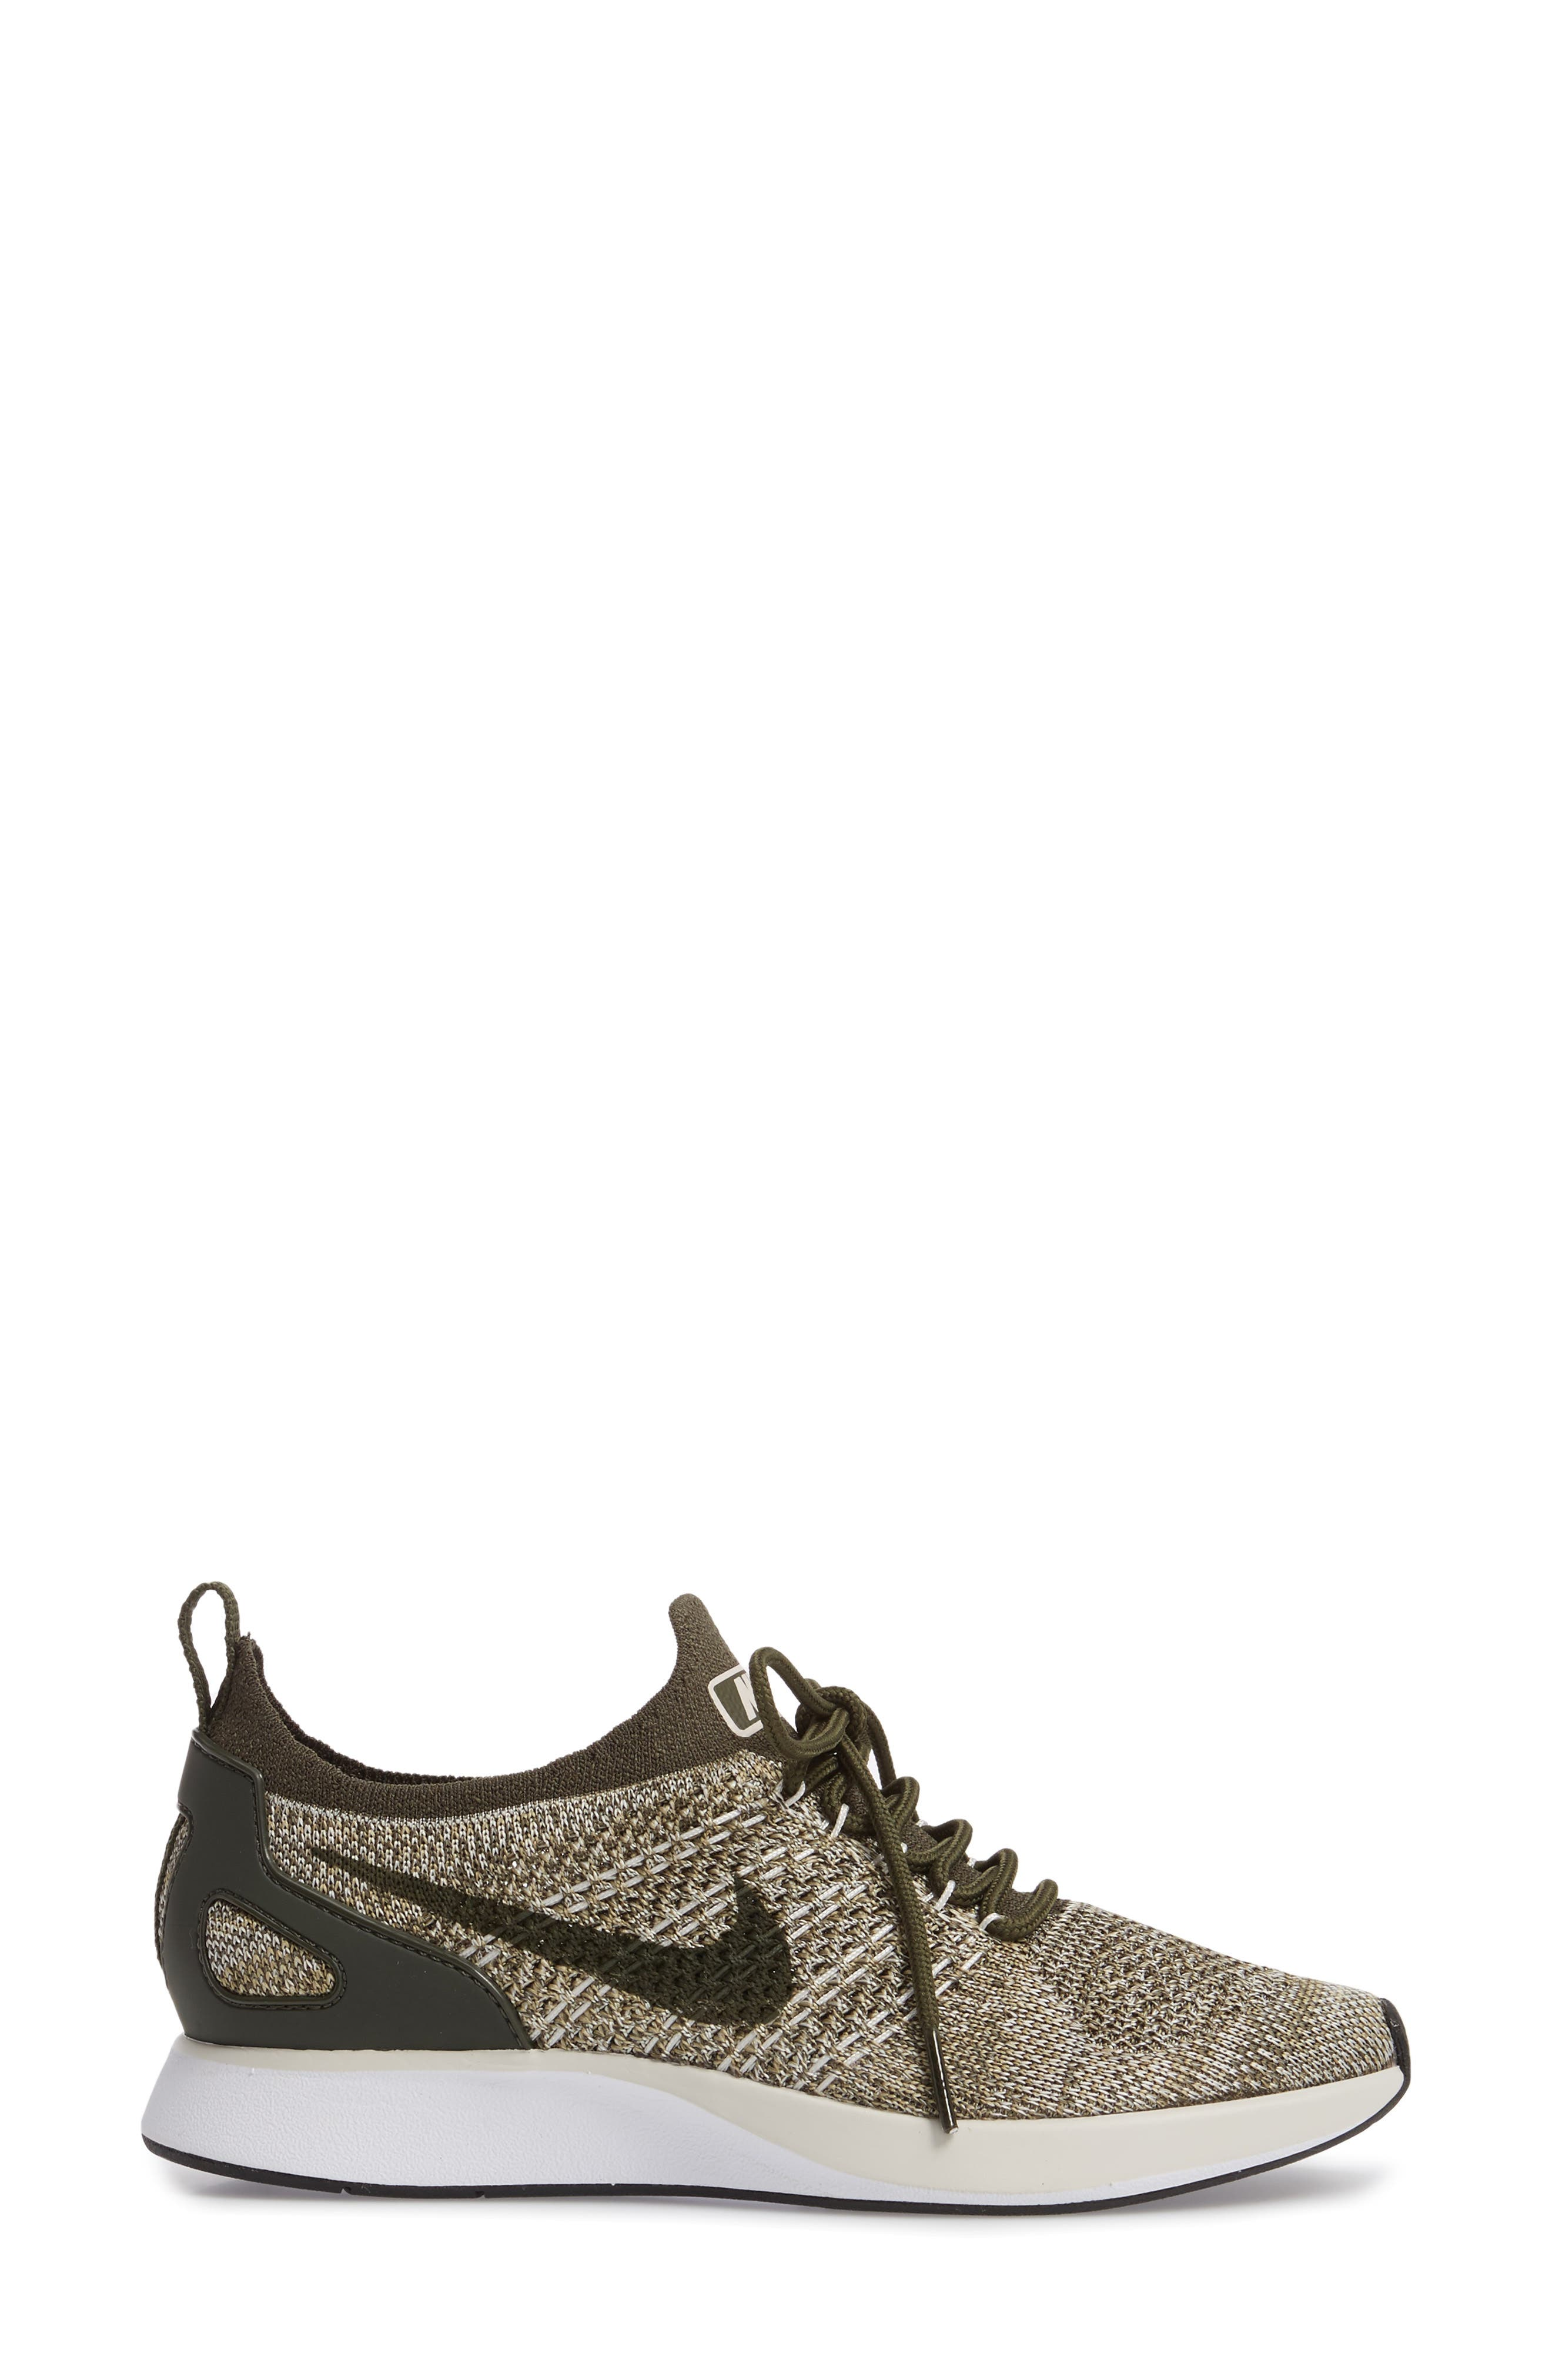 Air Zoom Mariah Flyknit Racer Sneaker,                             Alternate thumbnail 3, color,                             Cargo Khaki/ Cargo Khaki